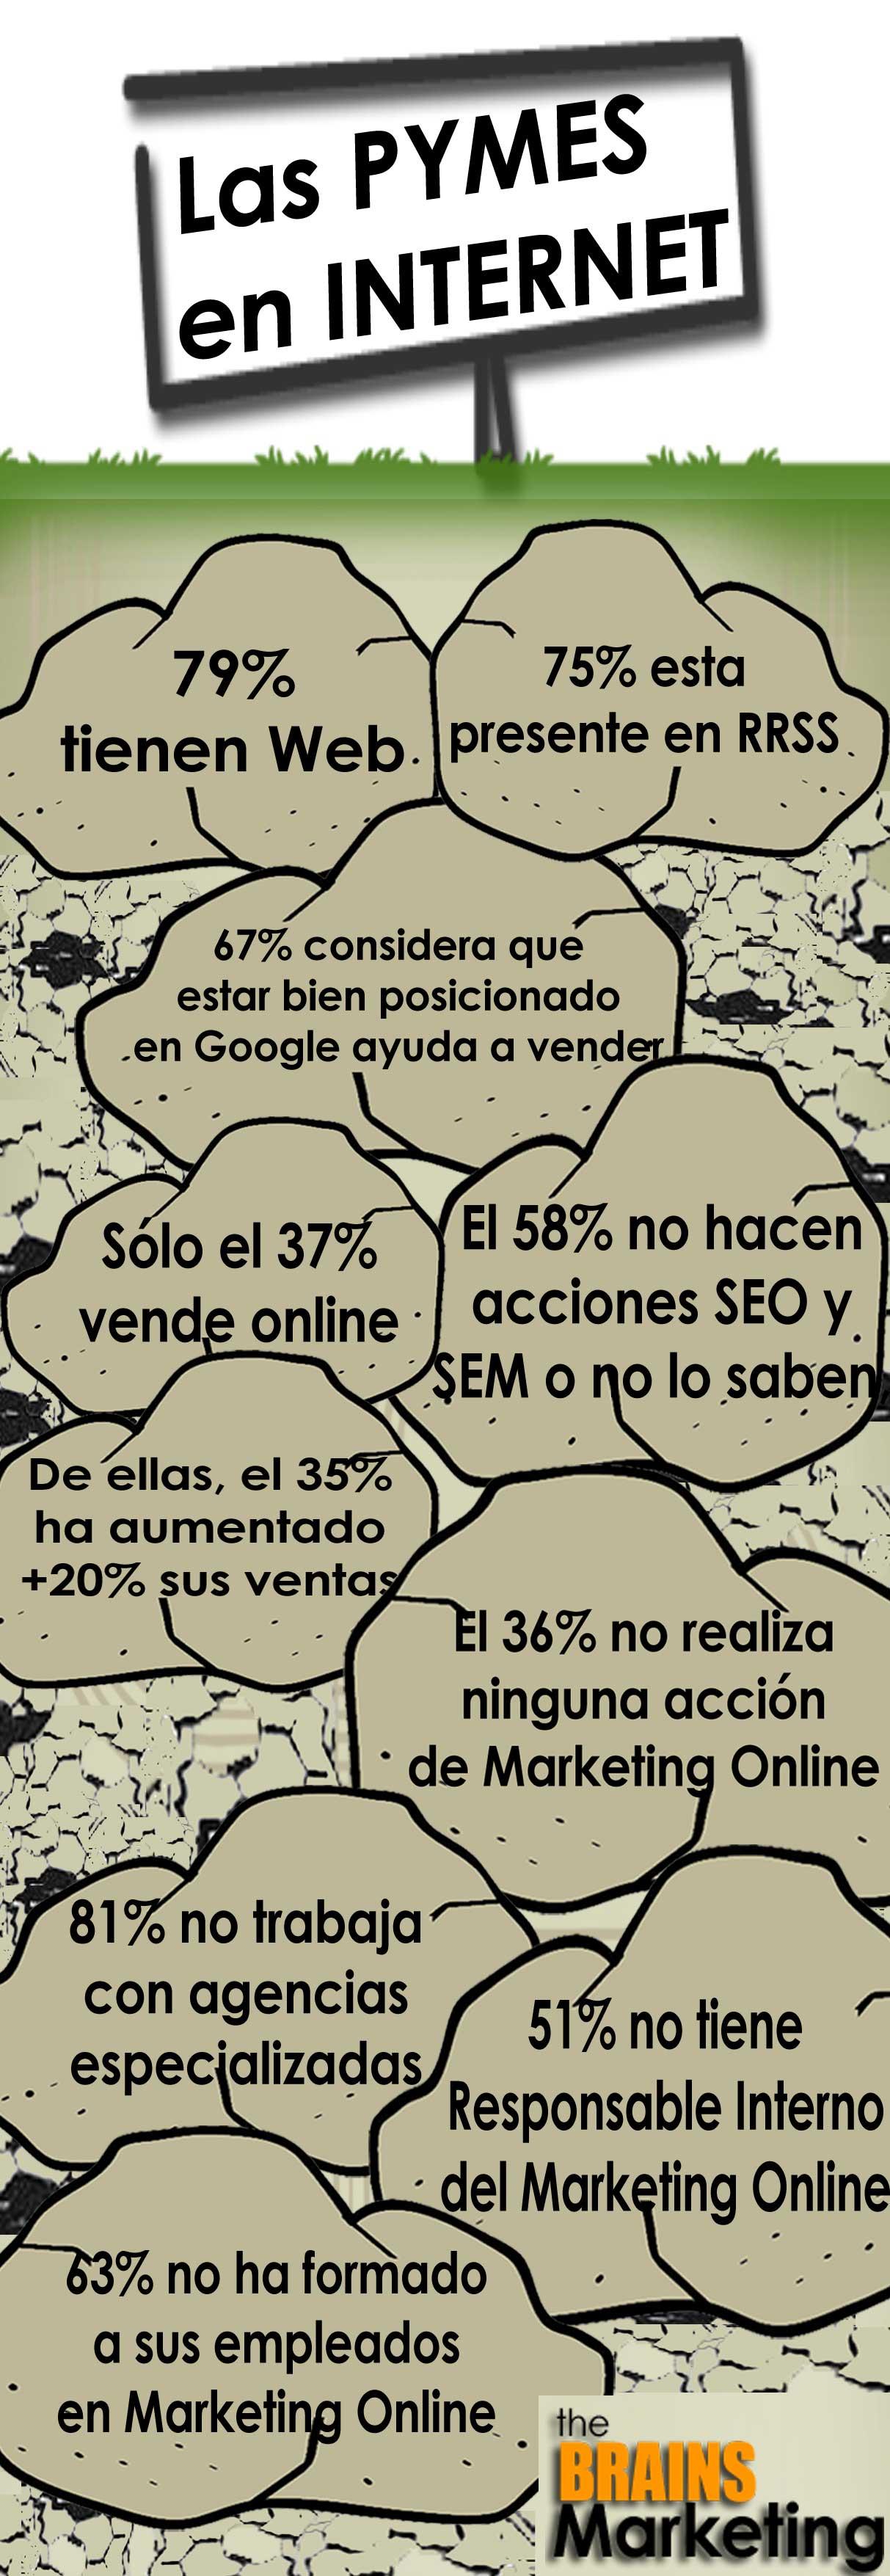 Se toman en serio las PYMES Internet?